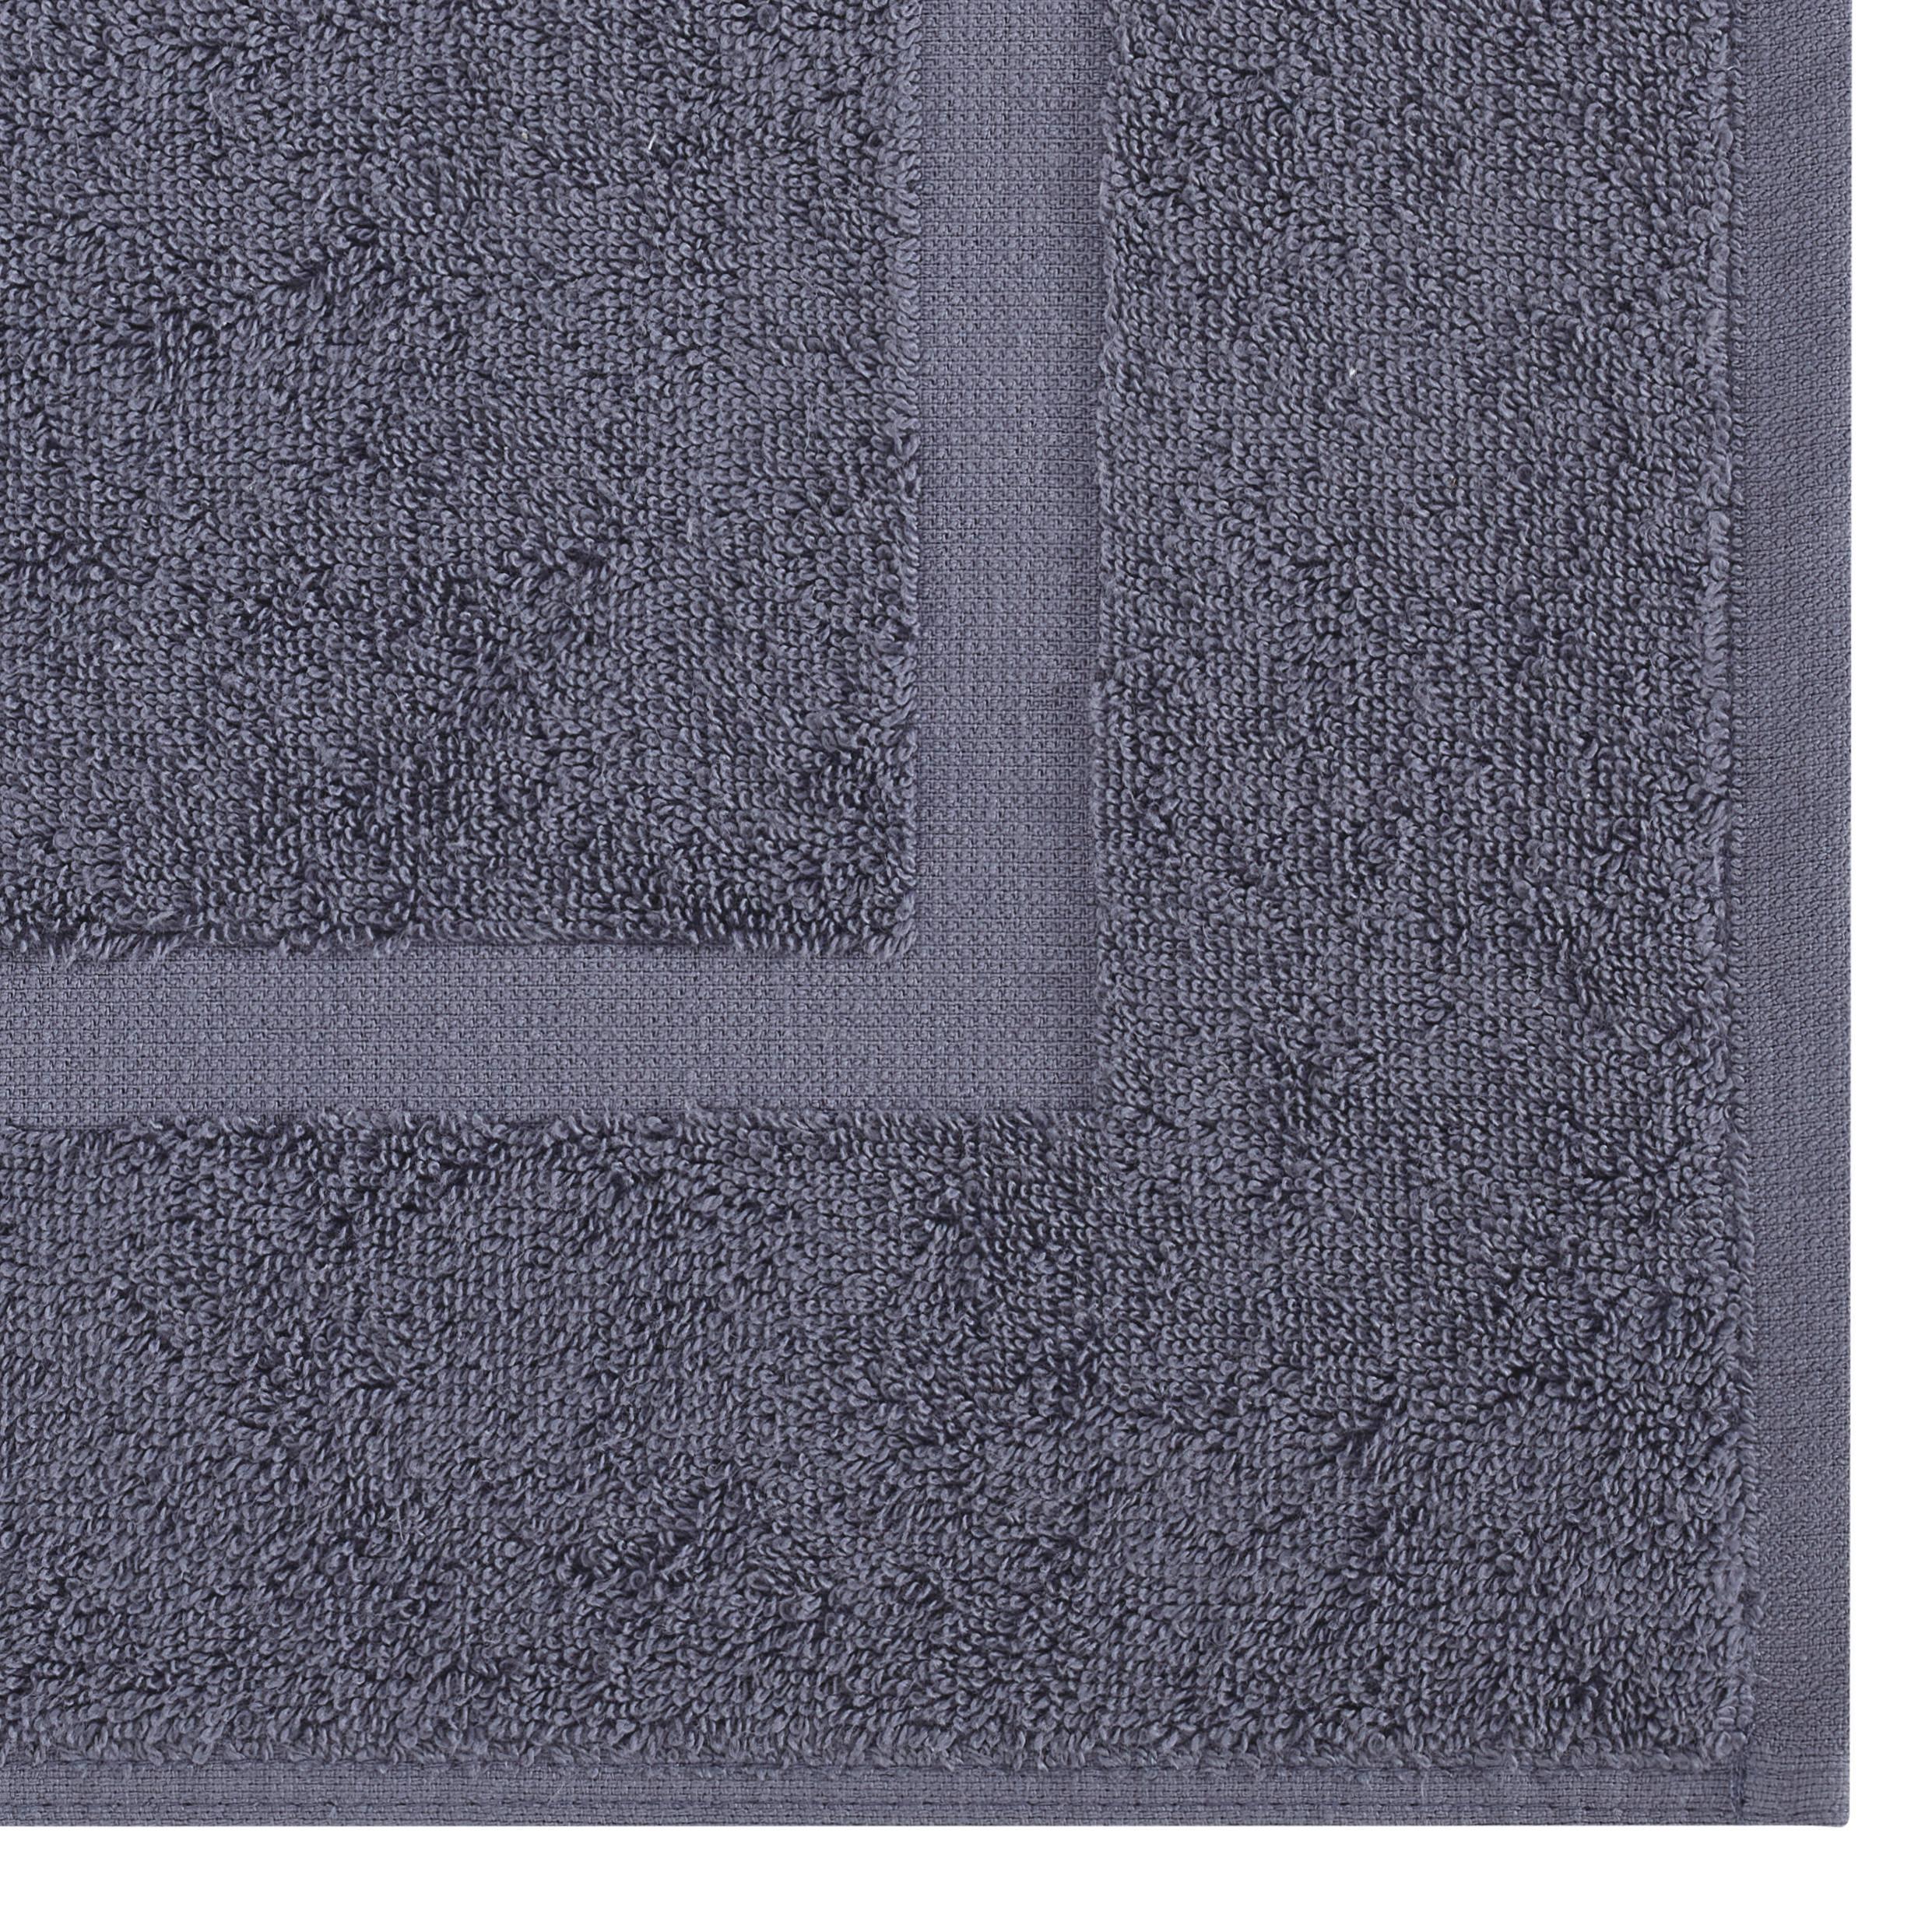 Badematte Dyckhoff 50x75cm - Grau, Textil (50/75cm) - DYCKHOFF